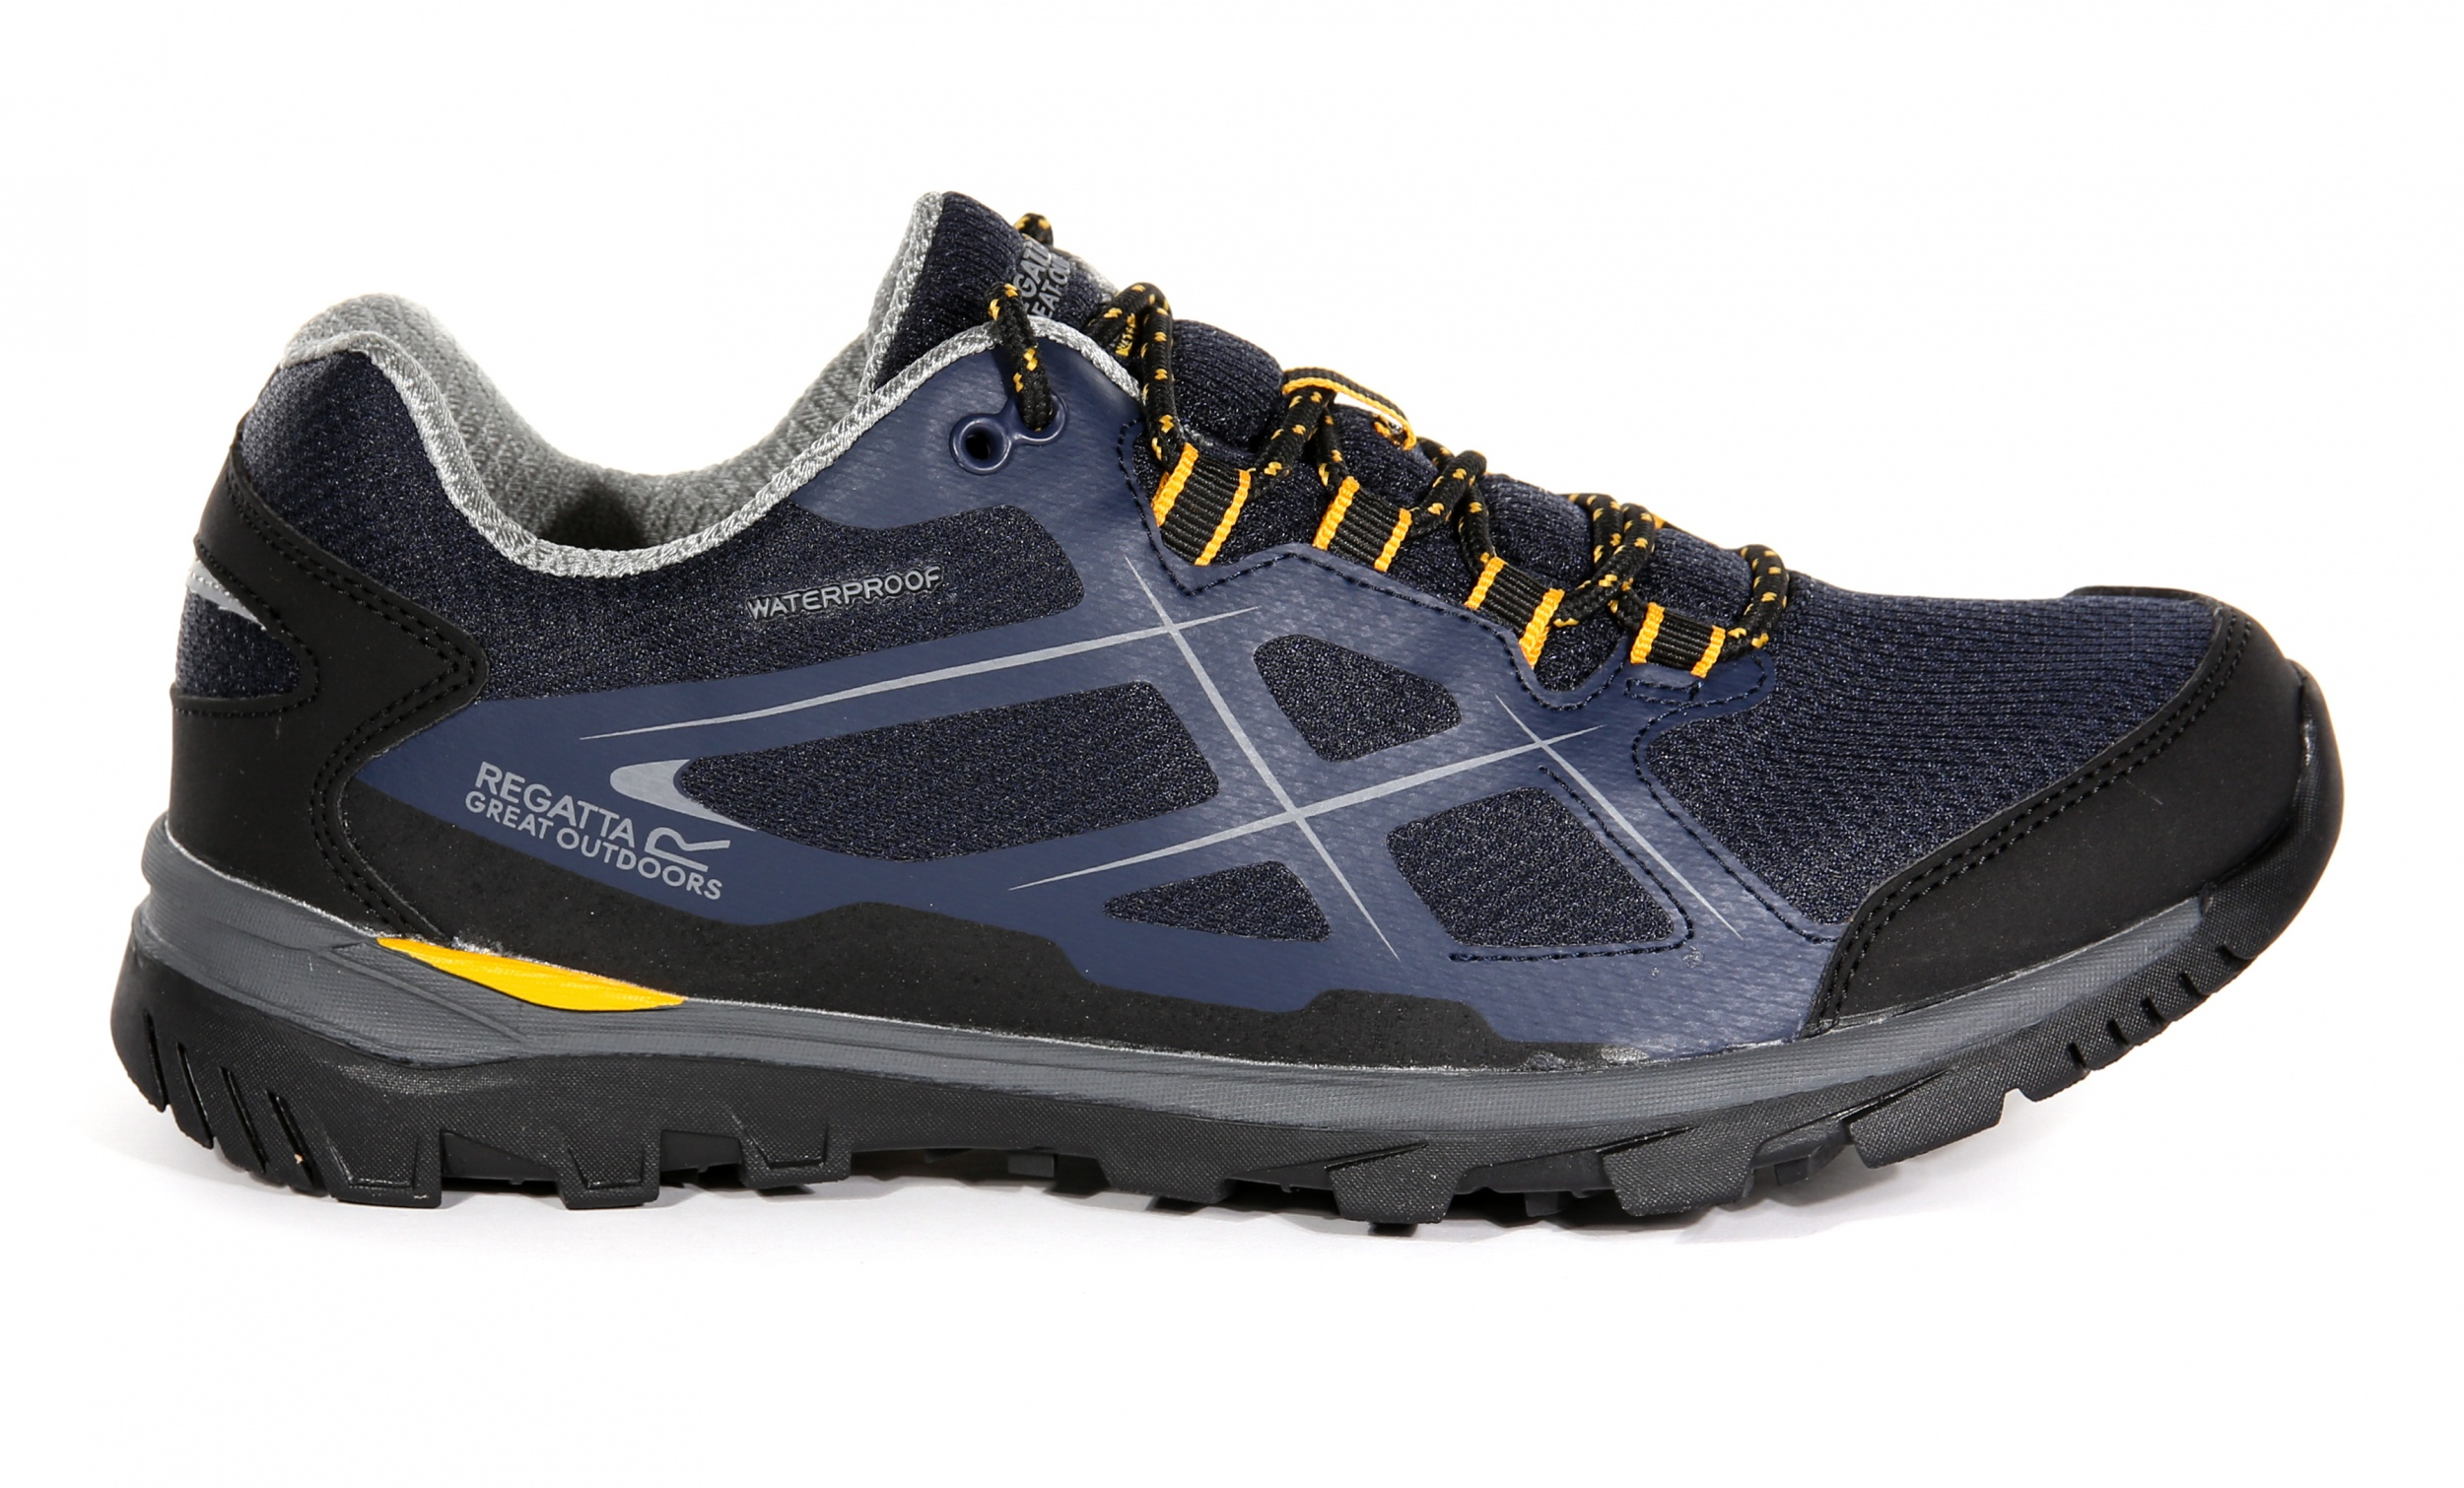 1224c2cad835ef Regatta hiking boots Kota Lowmen dark blue - Internet-Sport&Casuals